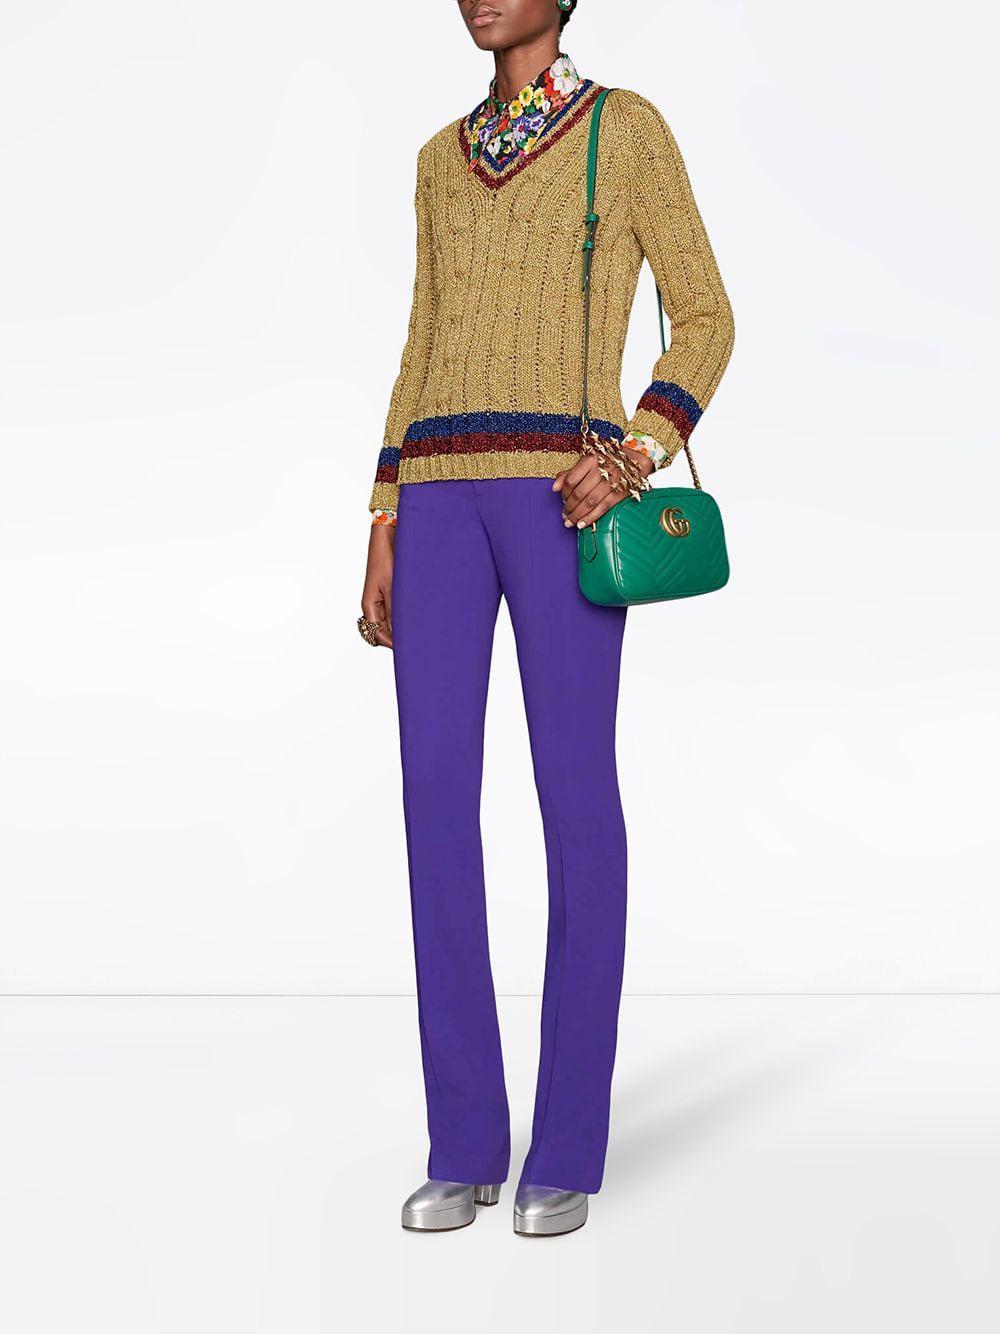 Gucci - Green Gg Marmont Small Shoulder Bag - Lyst. View fullscreen 79f2212751669